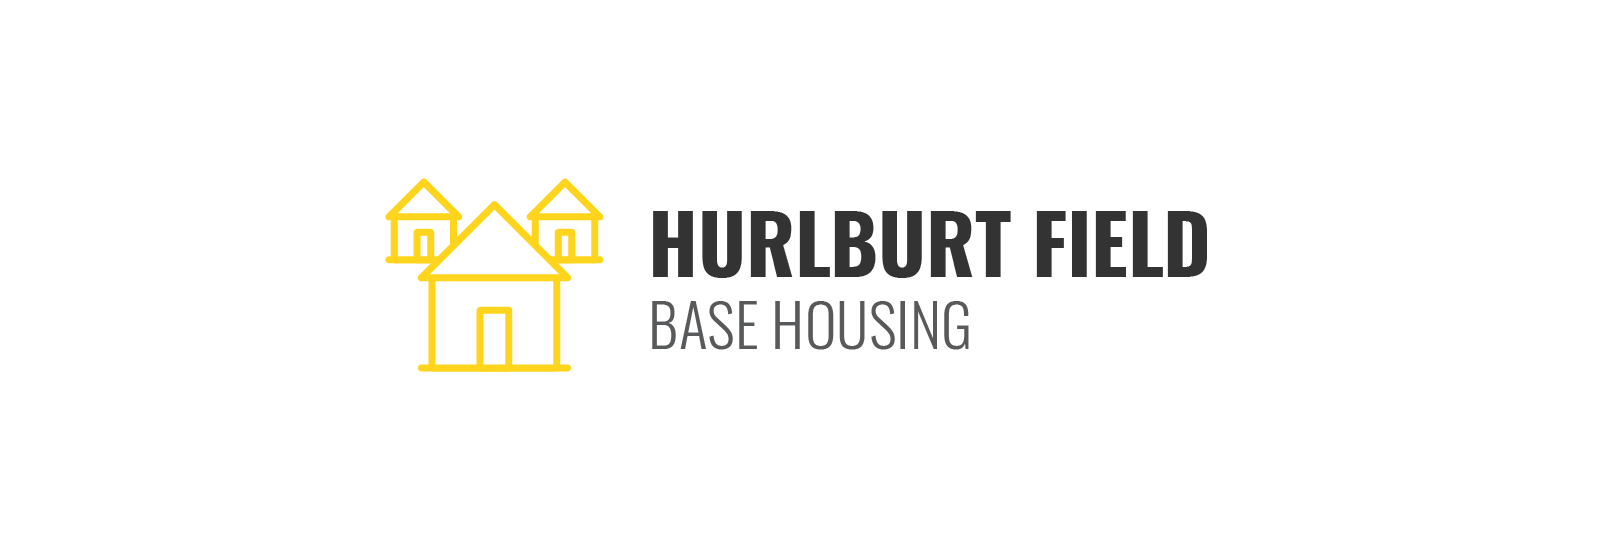 Hurlburt Field Base Housing